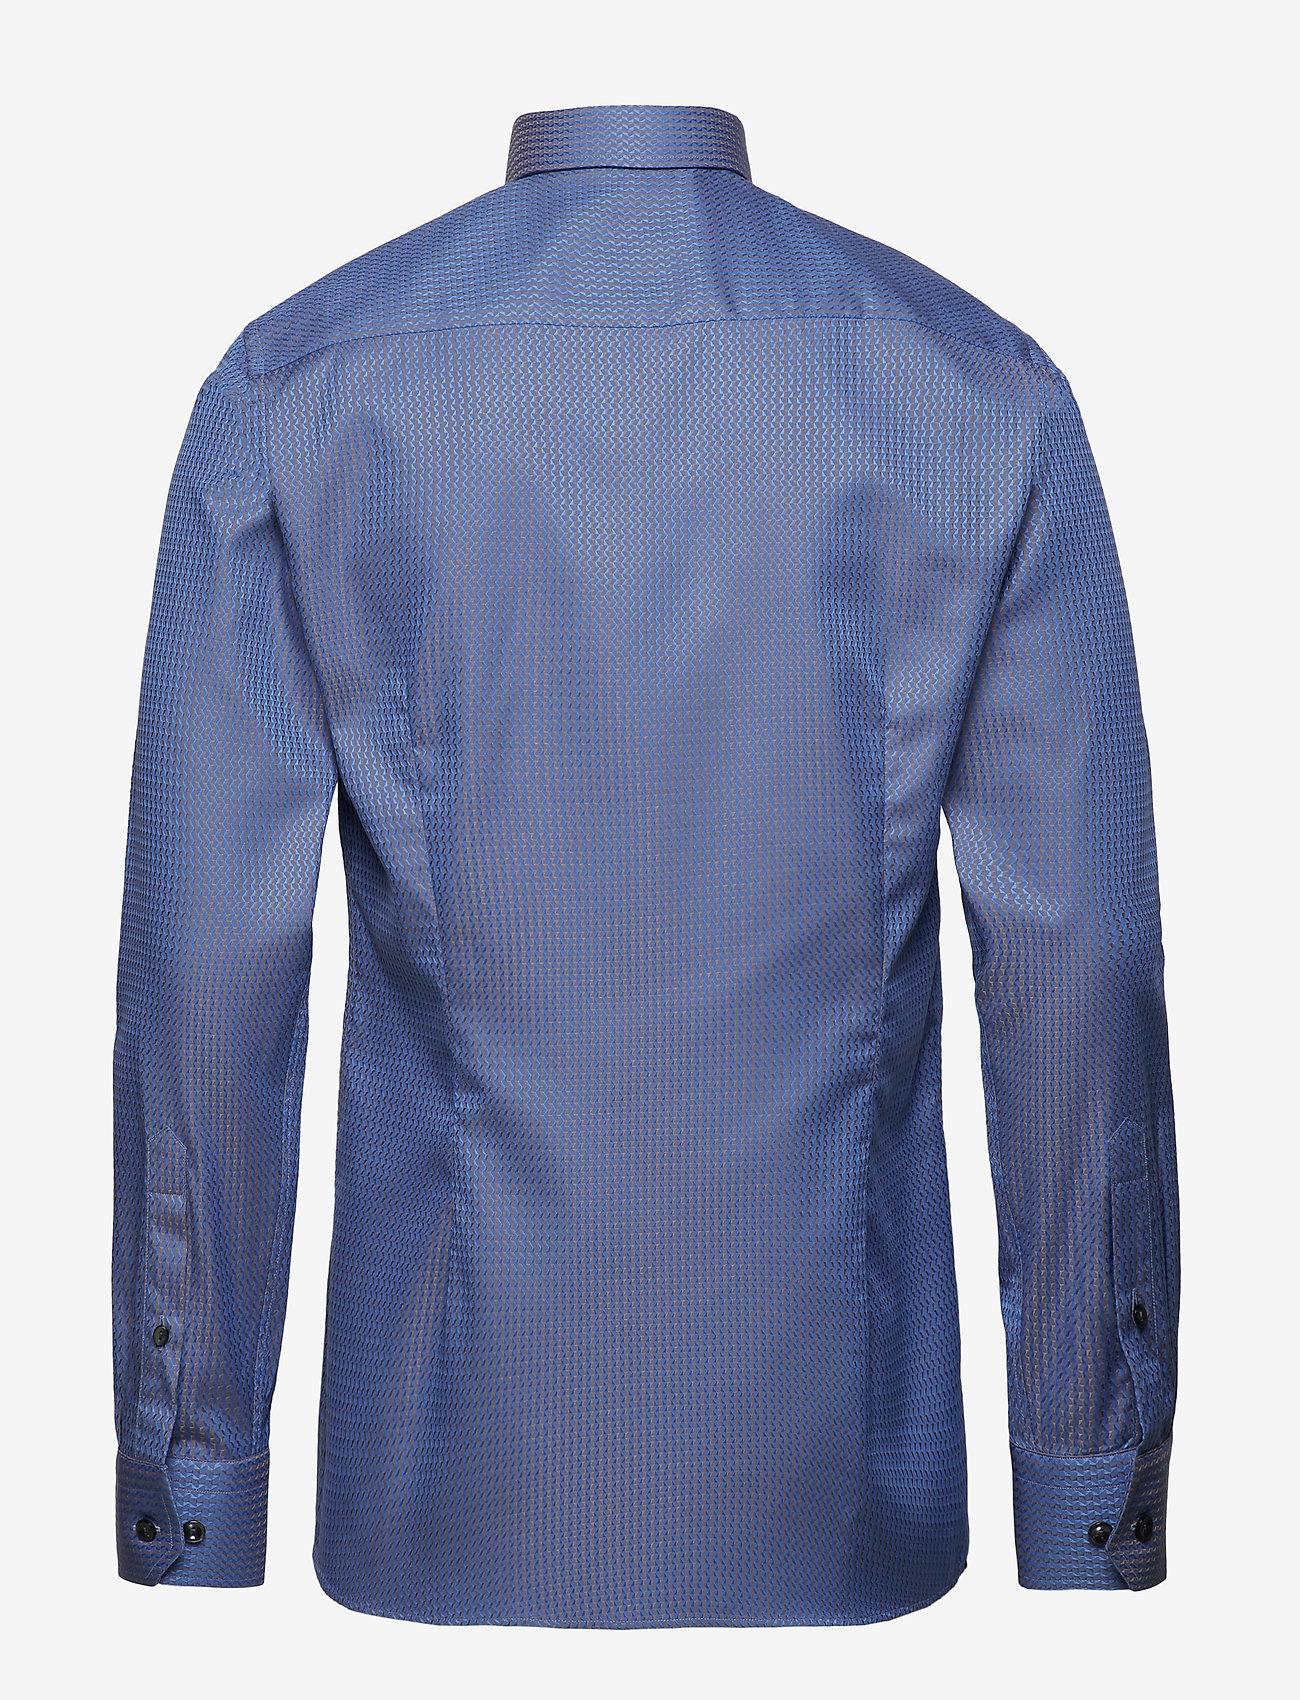 Blue & Beige Jacquard Shirt (Blue) (1019.40 kr) - Eton